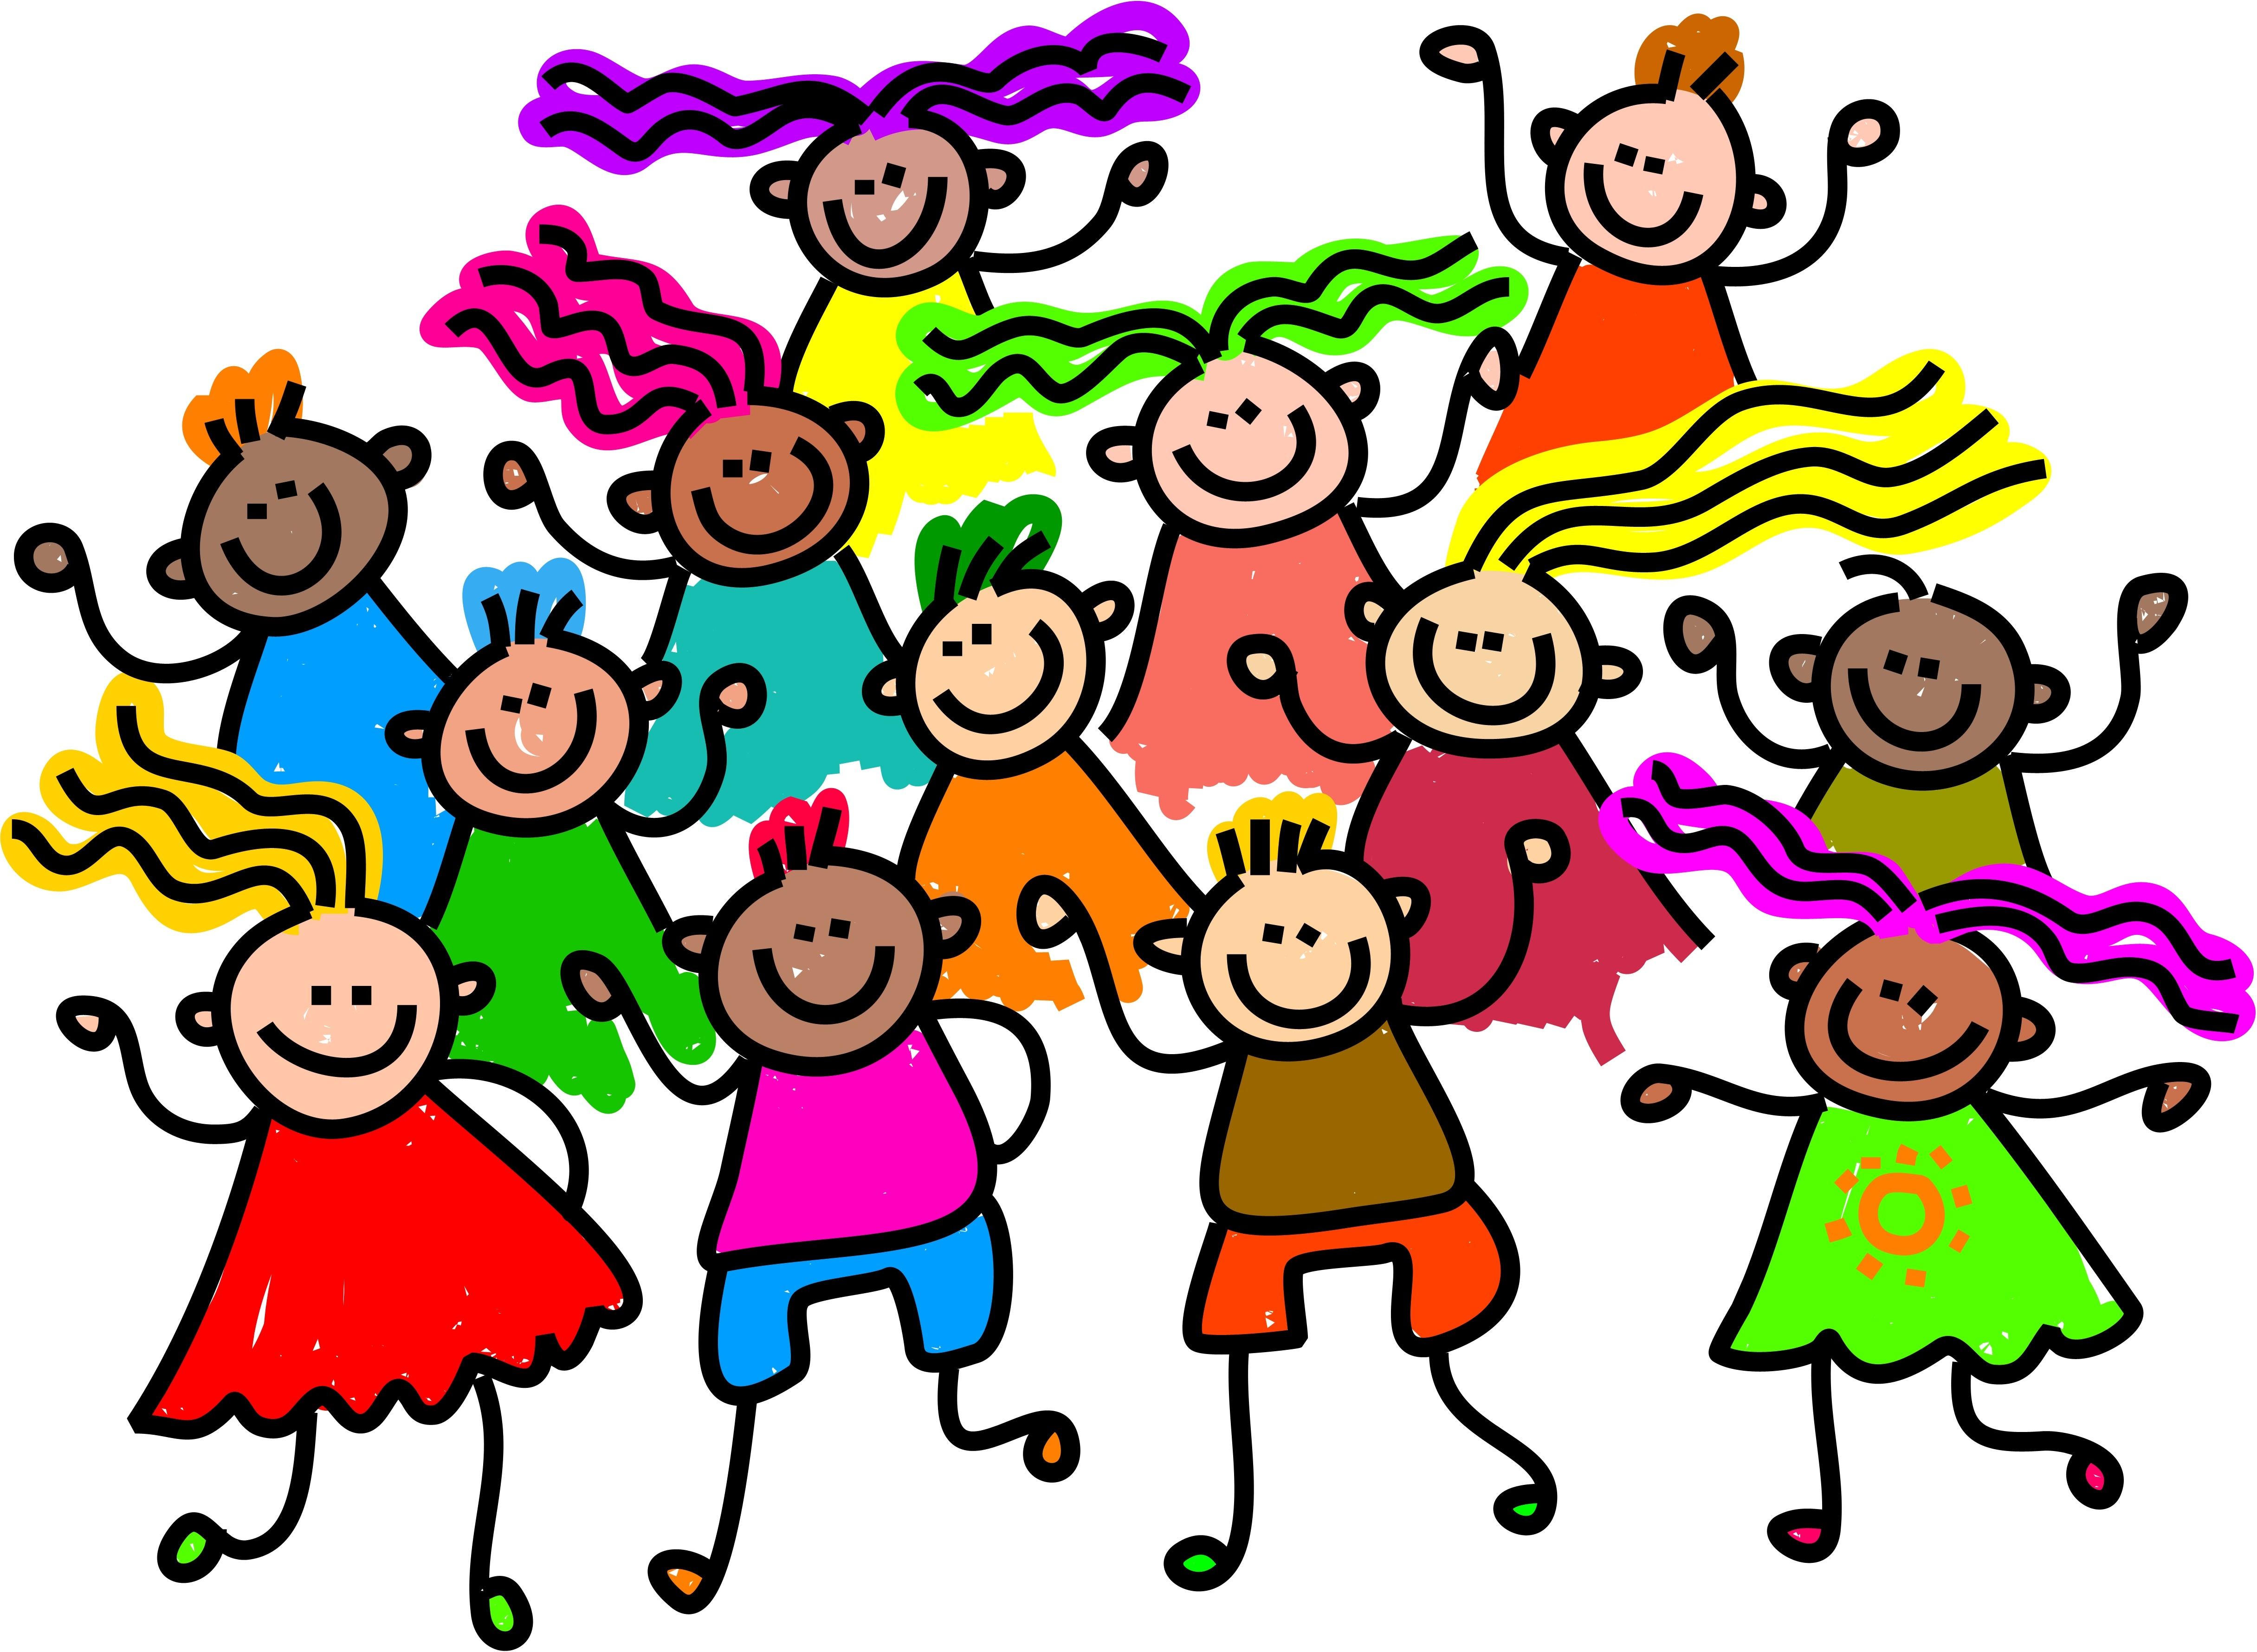 Free developmental cliparts download. Community clipart community participation